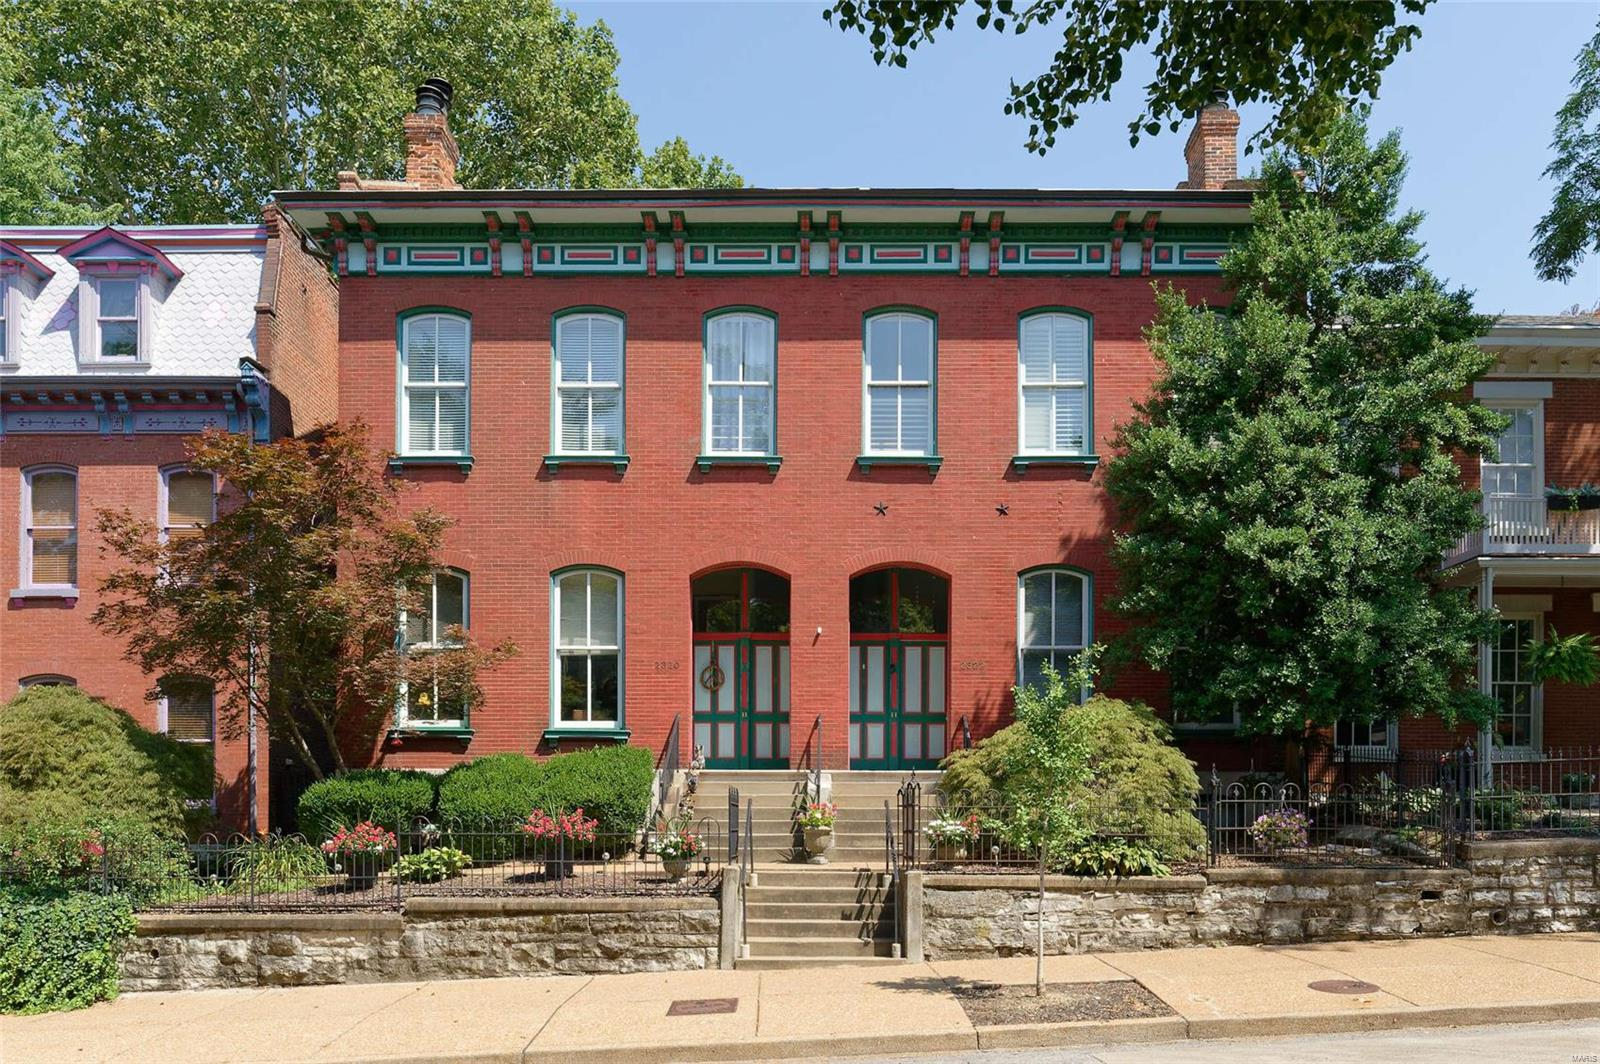 11th Street Condo Real Estate Listings Main Image